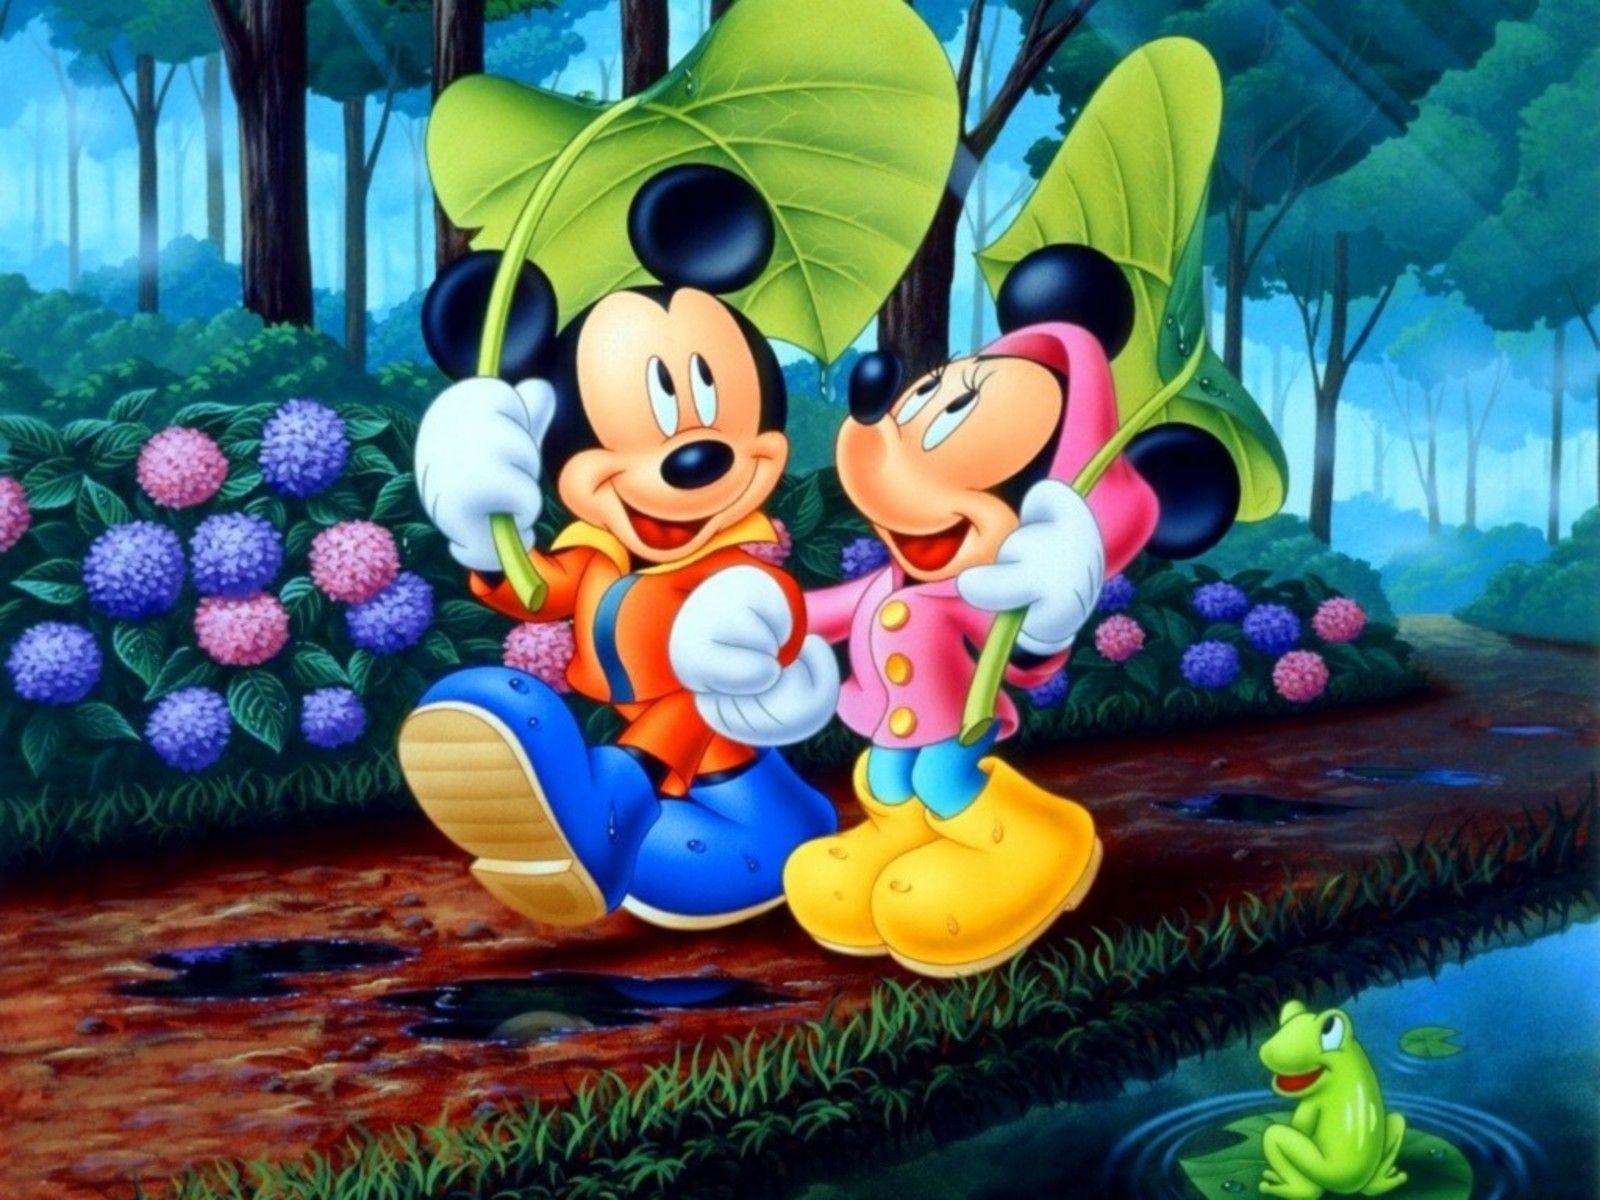 Disney Cartoon Mickey Mouse Wallpaper HD 5 High Resolution Wallpaper Full Size